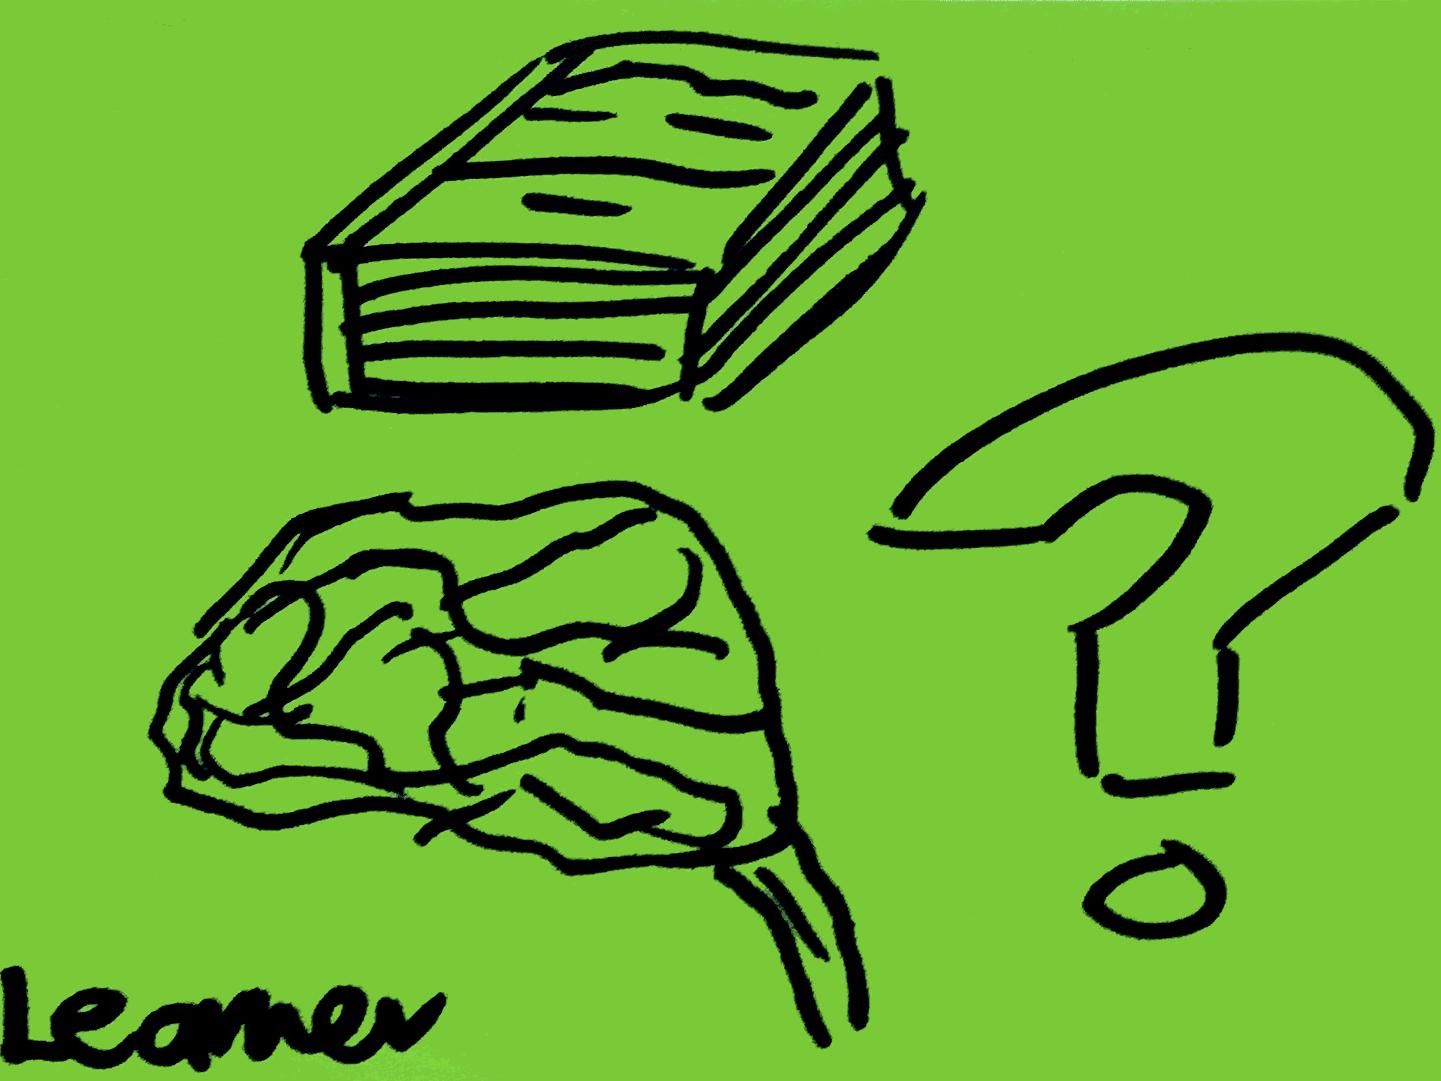 Learner Strengthsfinder Singapore Brain Thinkning Book